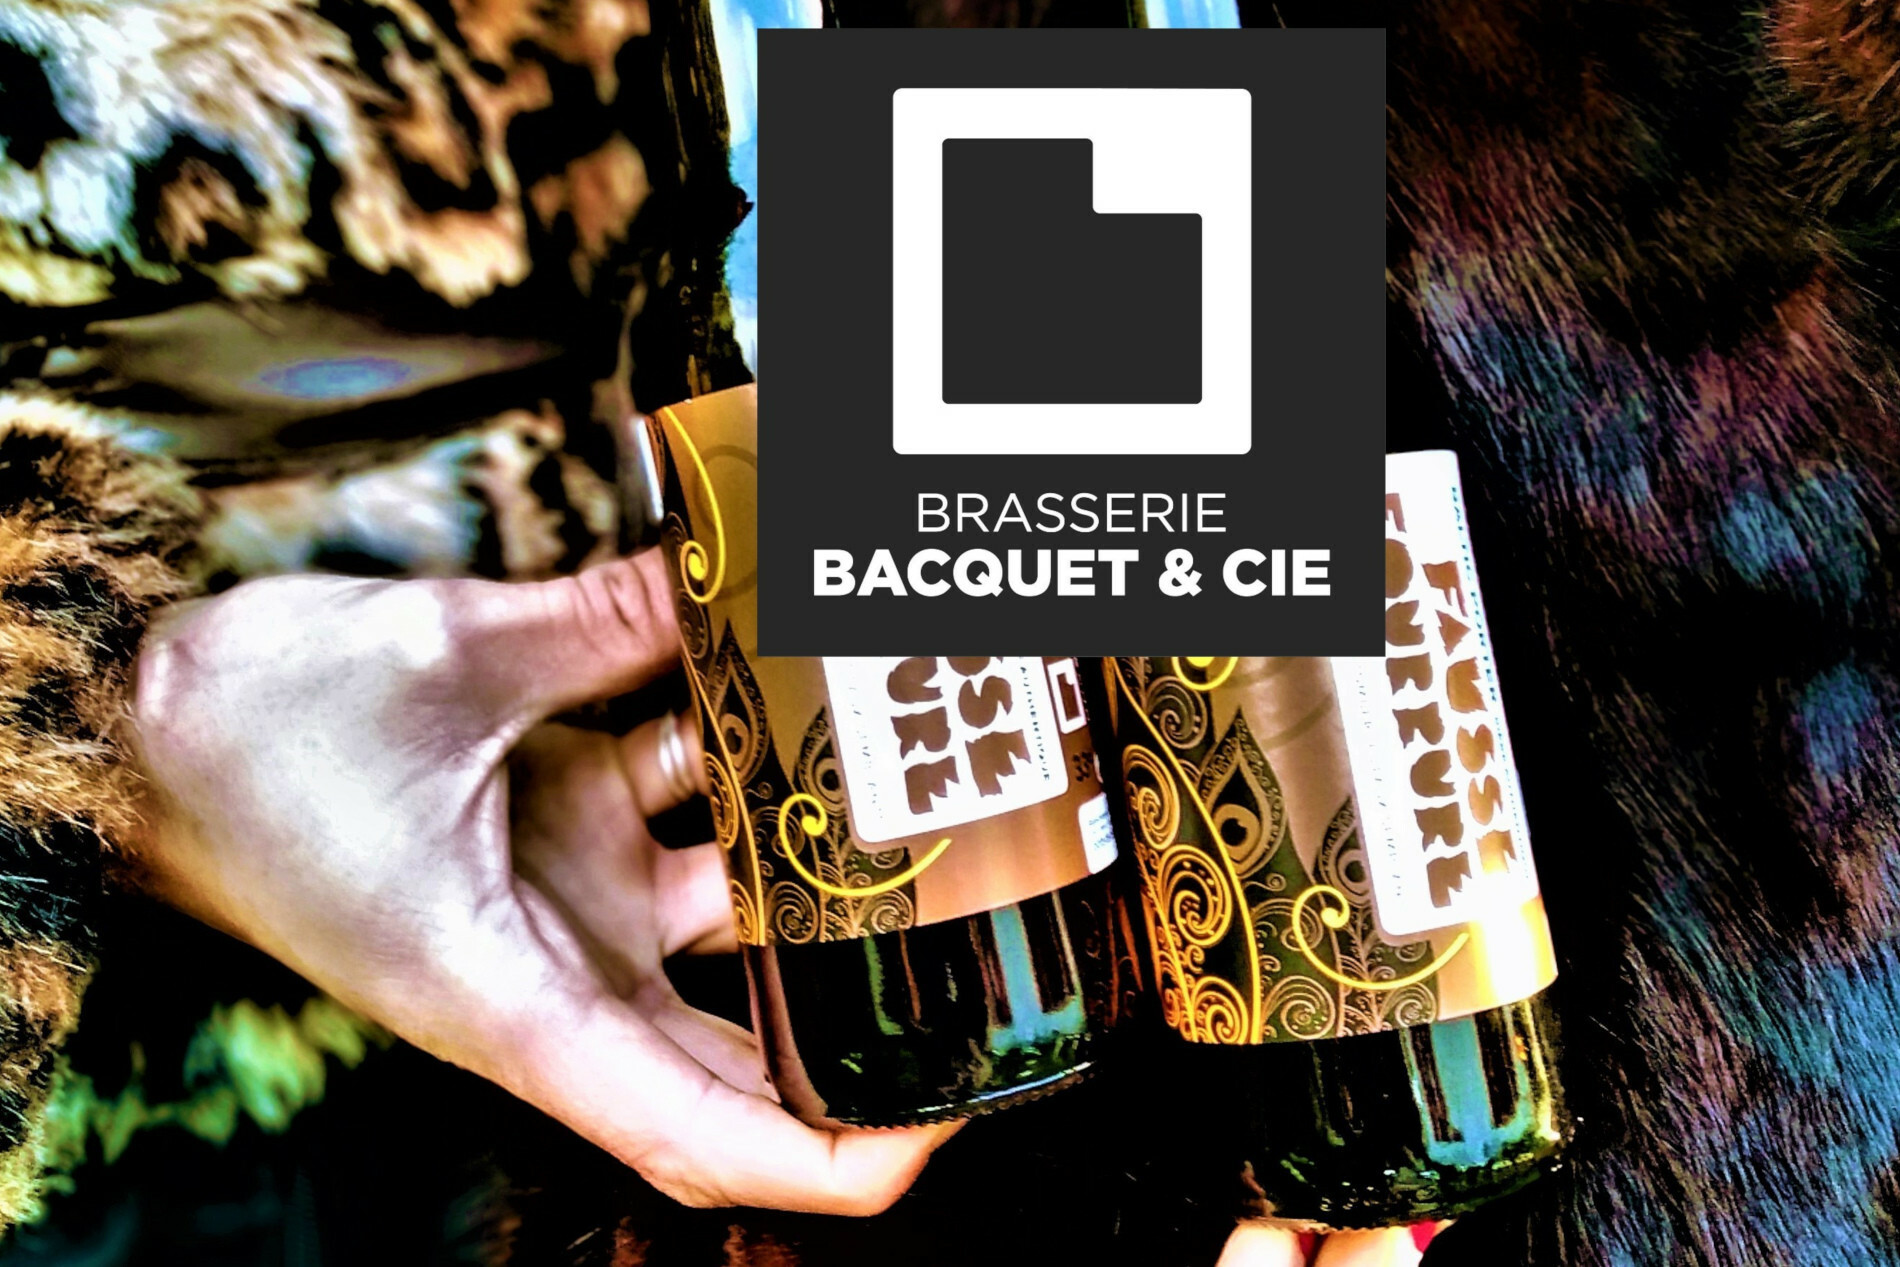 Brasserie Bacquet